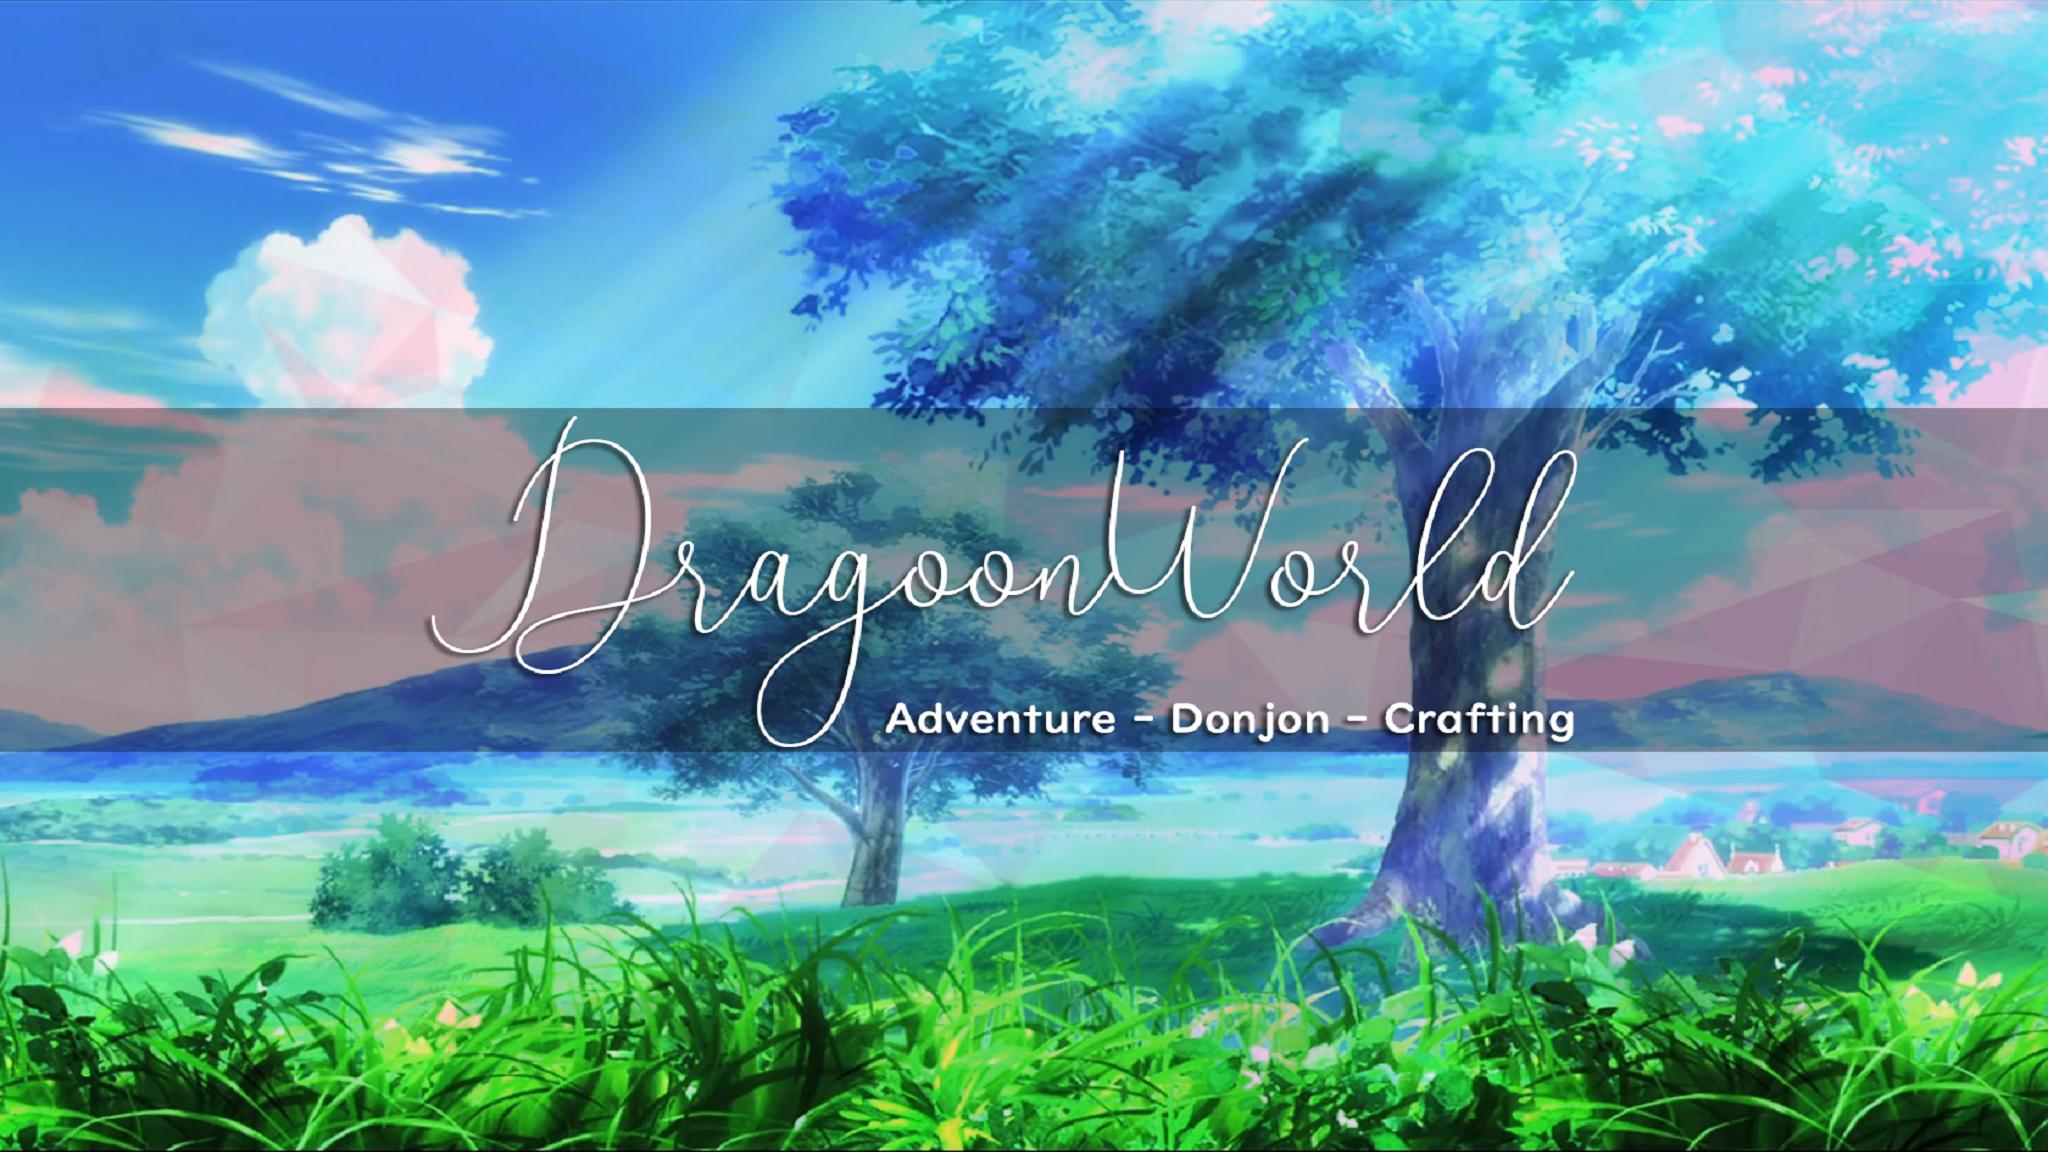 DragoonWorld